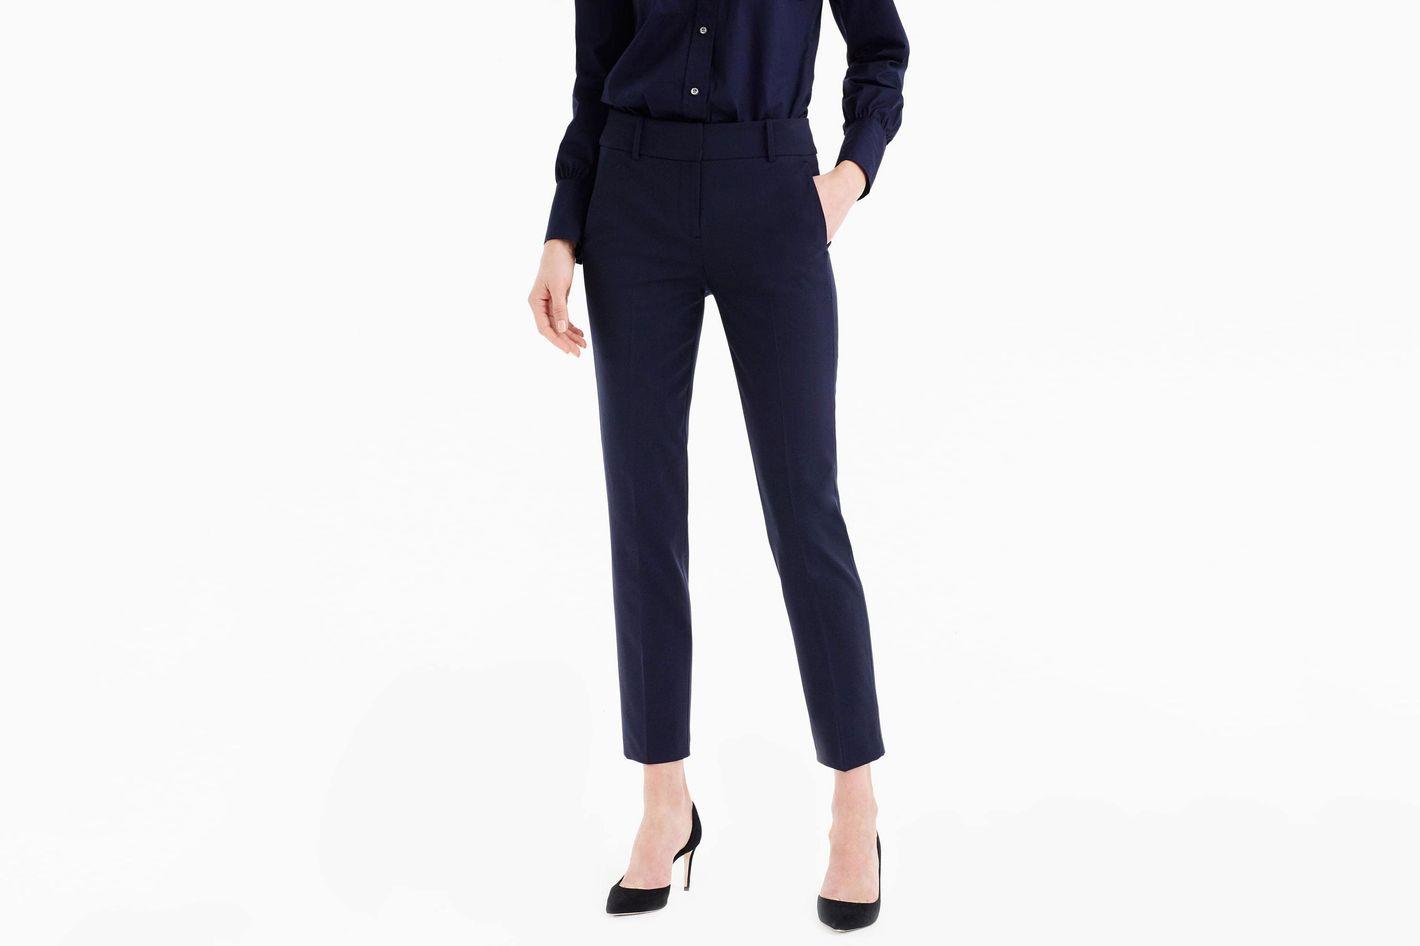 6f737871d94c Buy. Cameron Slim Crop Pants in Italian Two-Way Stretch Wool Pants